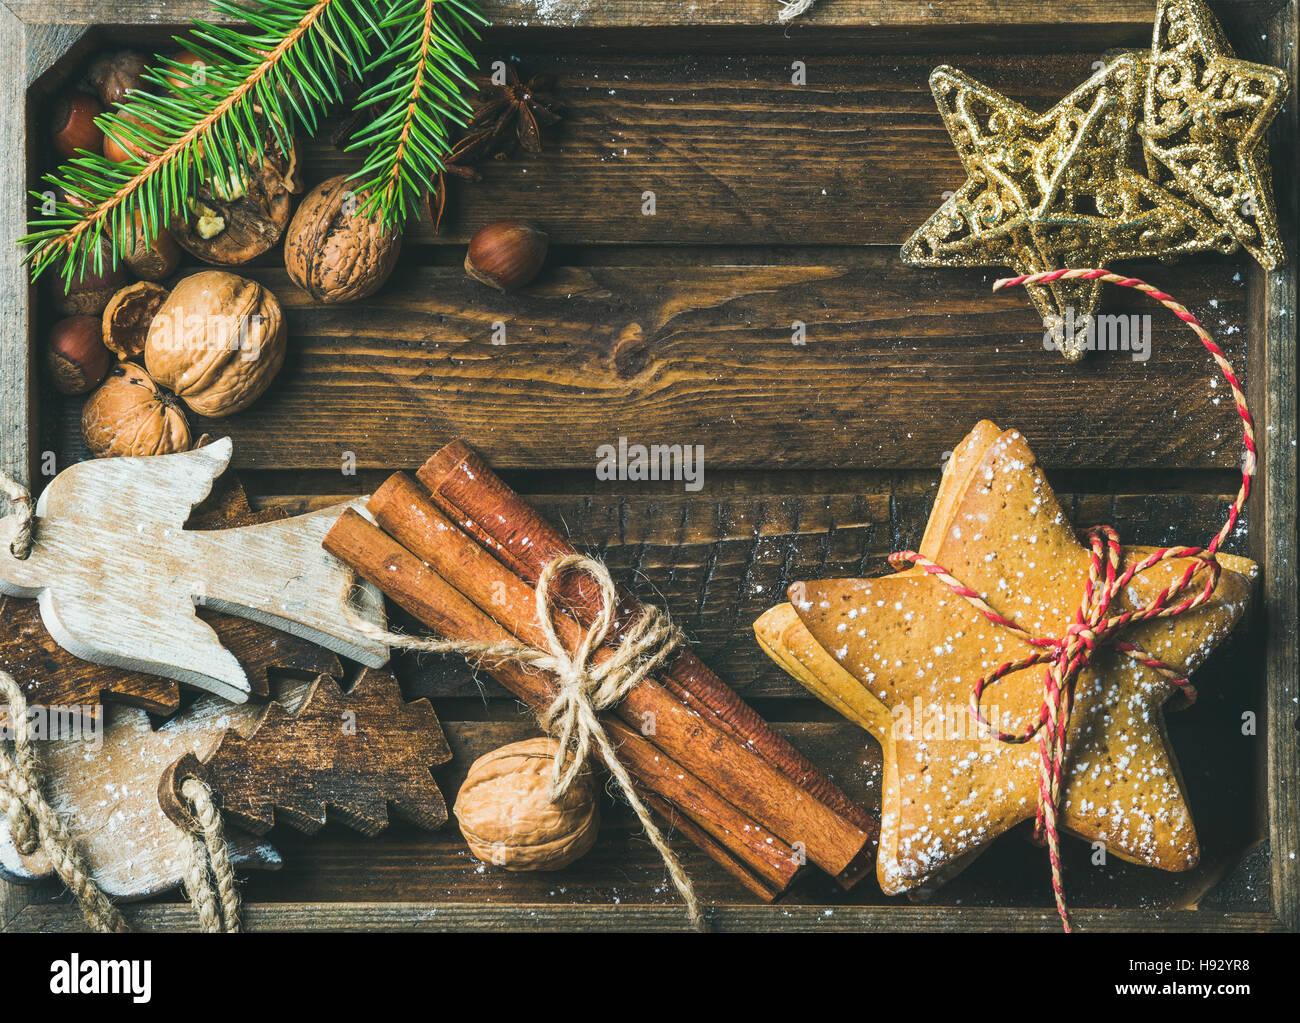 Sweet cookies, wooden angels, decorative golden stars, nuts, cinnamon sticks - Stock Image